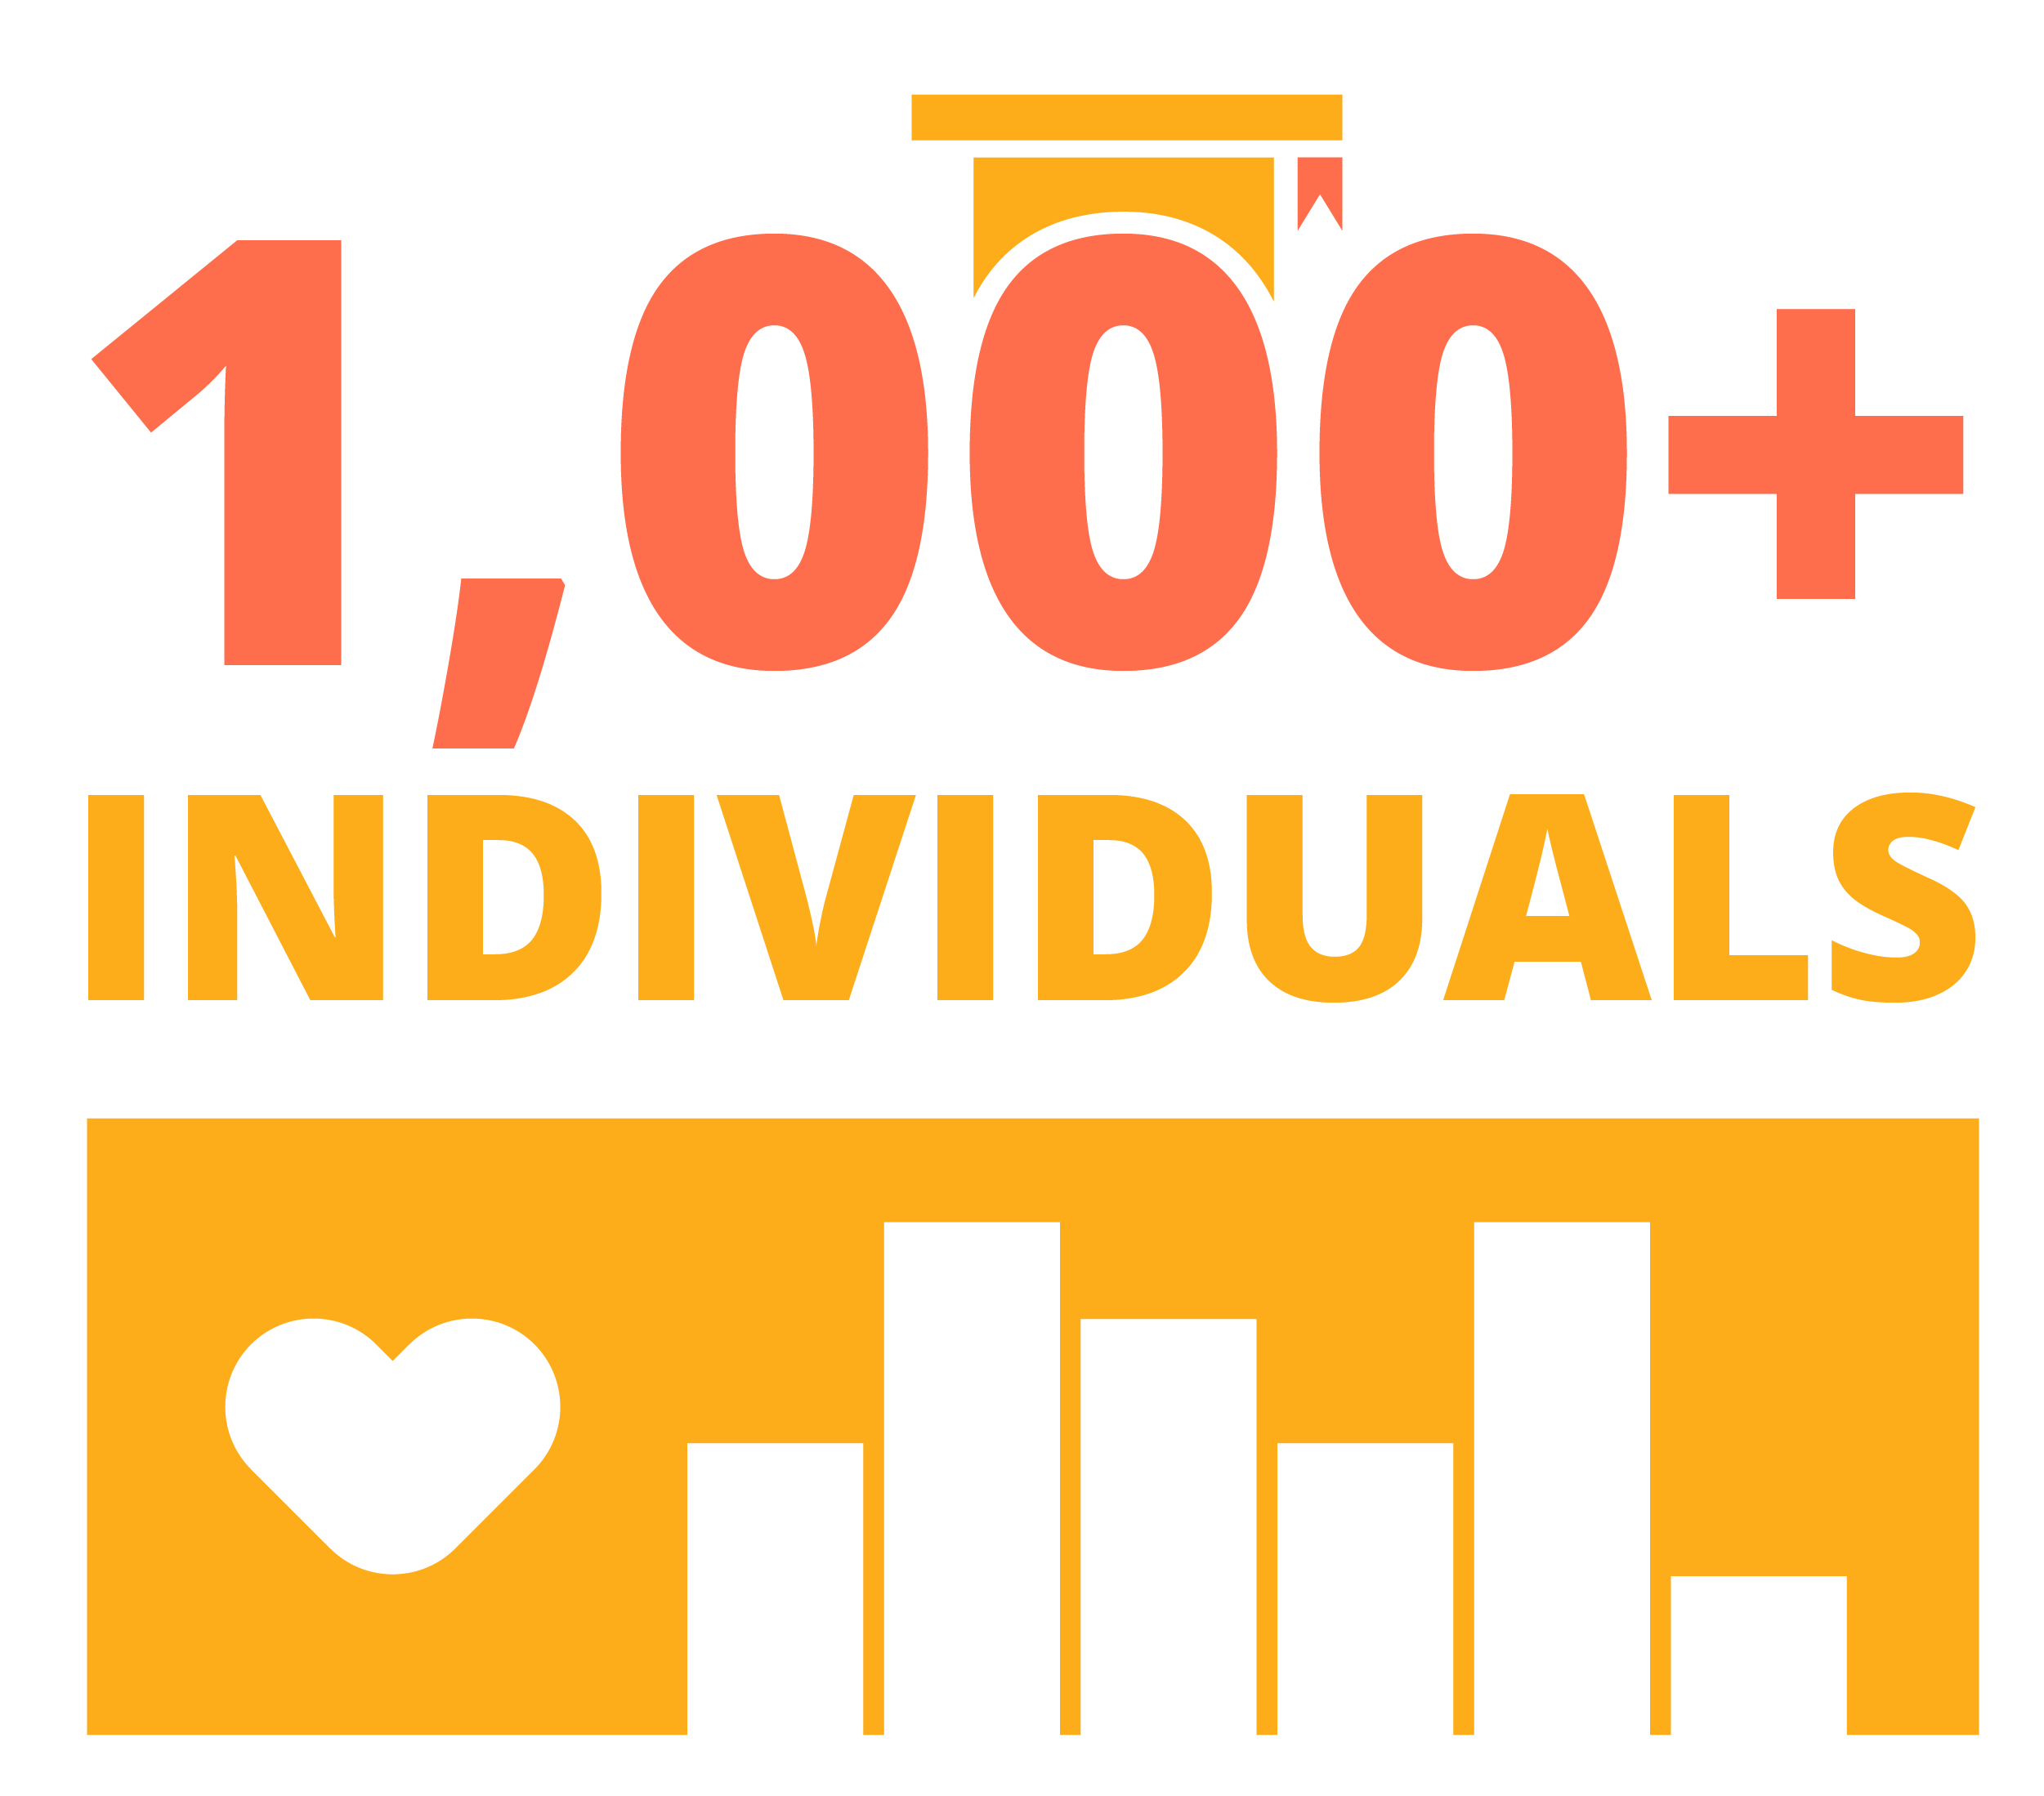 Infographic - 1000+ Individuals